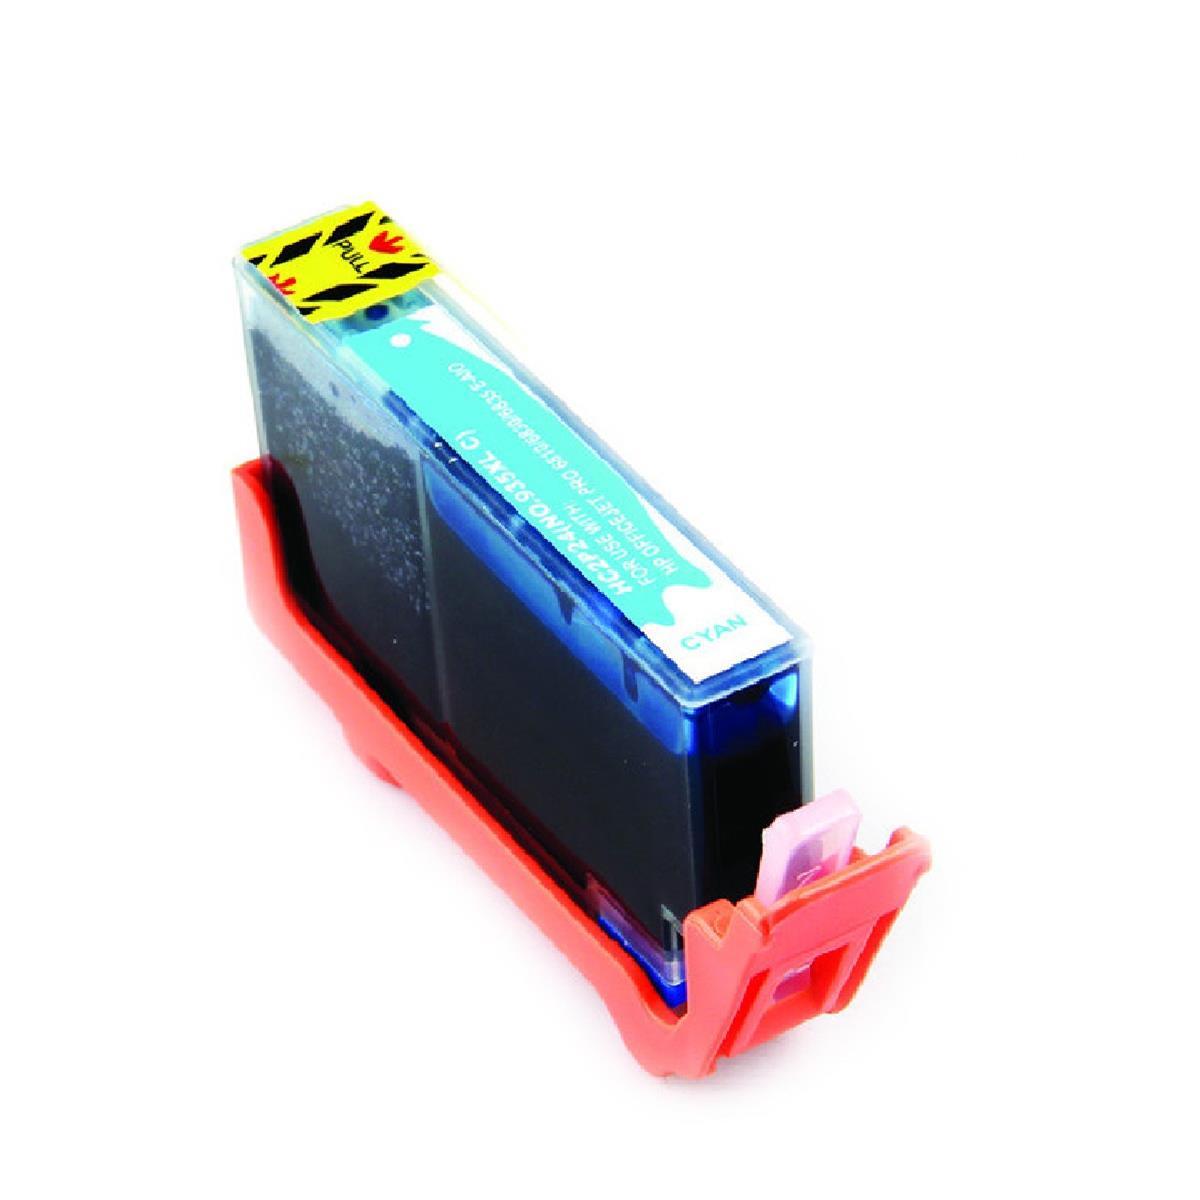 CARTUCHO 935 XL 935XL OFFICEJET PRO 6830 6230 AZUL 16ML COMPATÍVEL